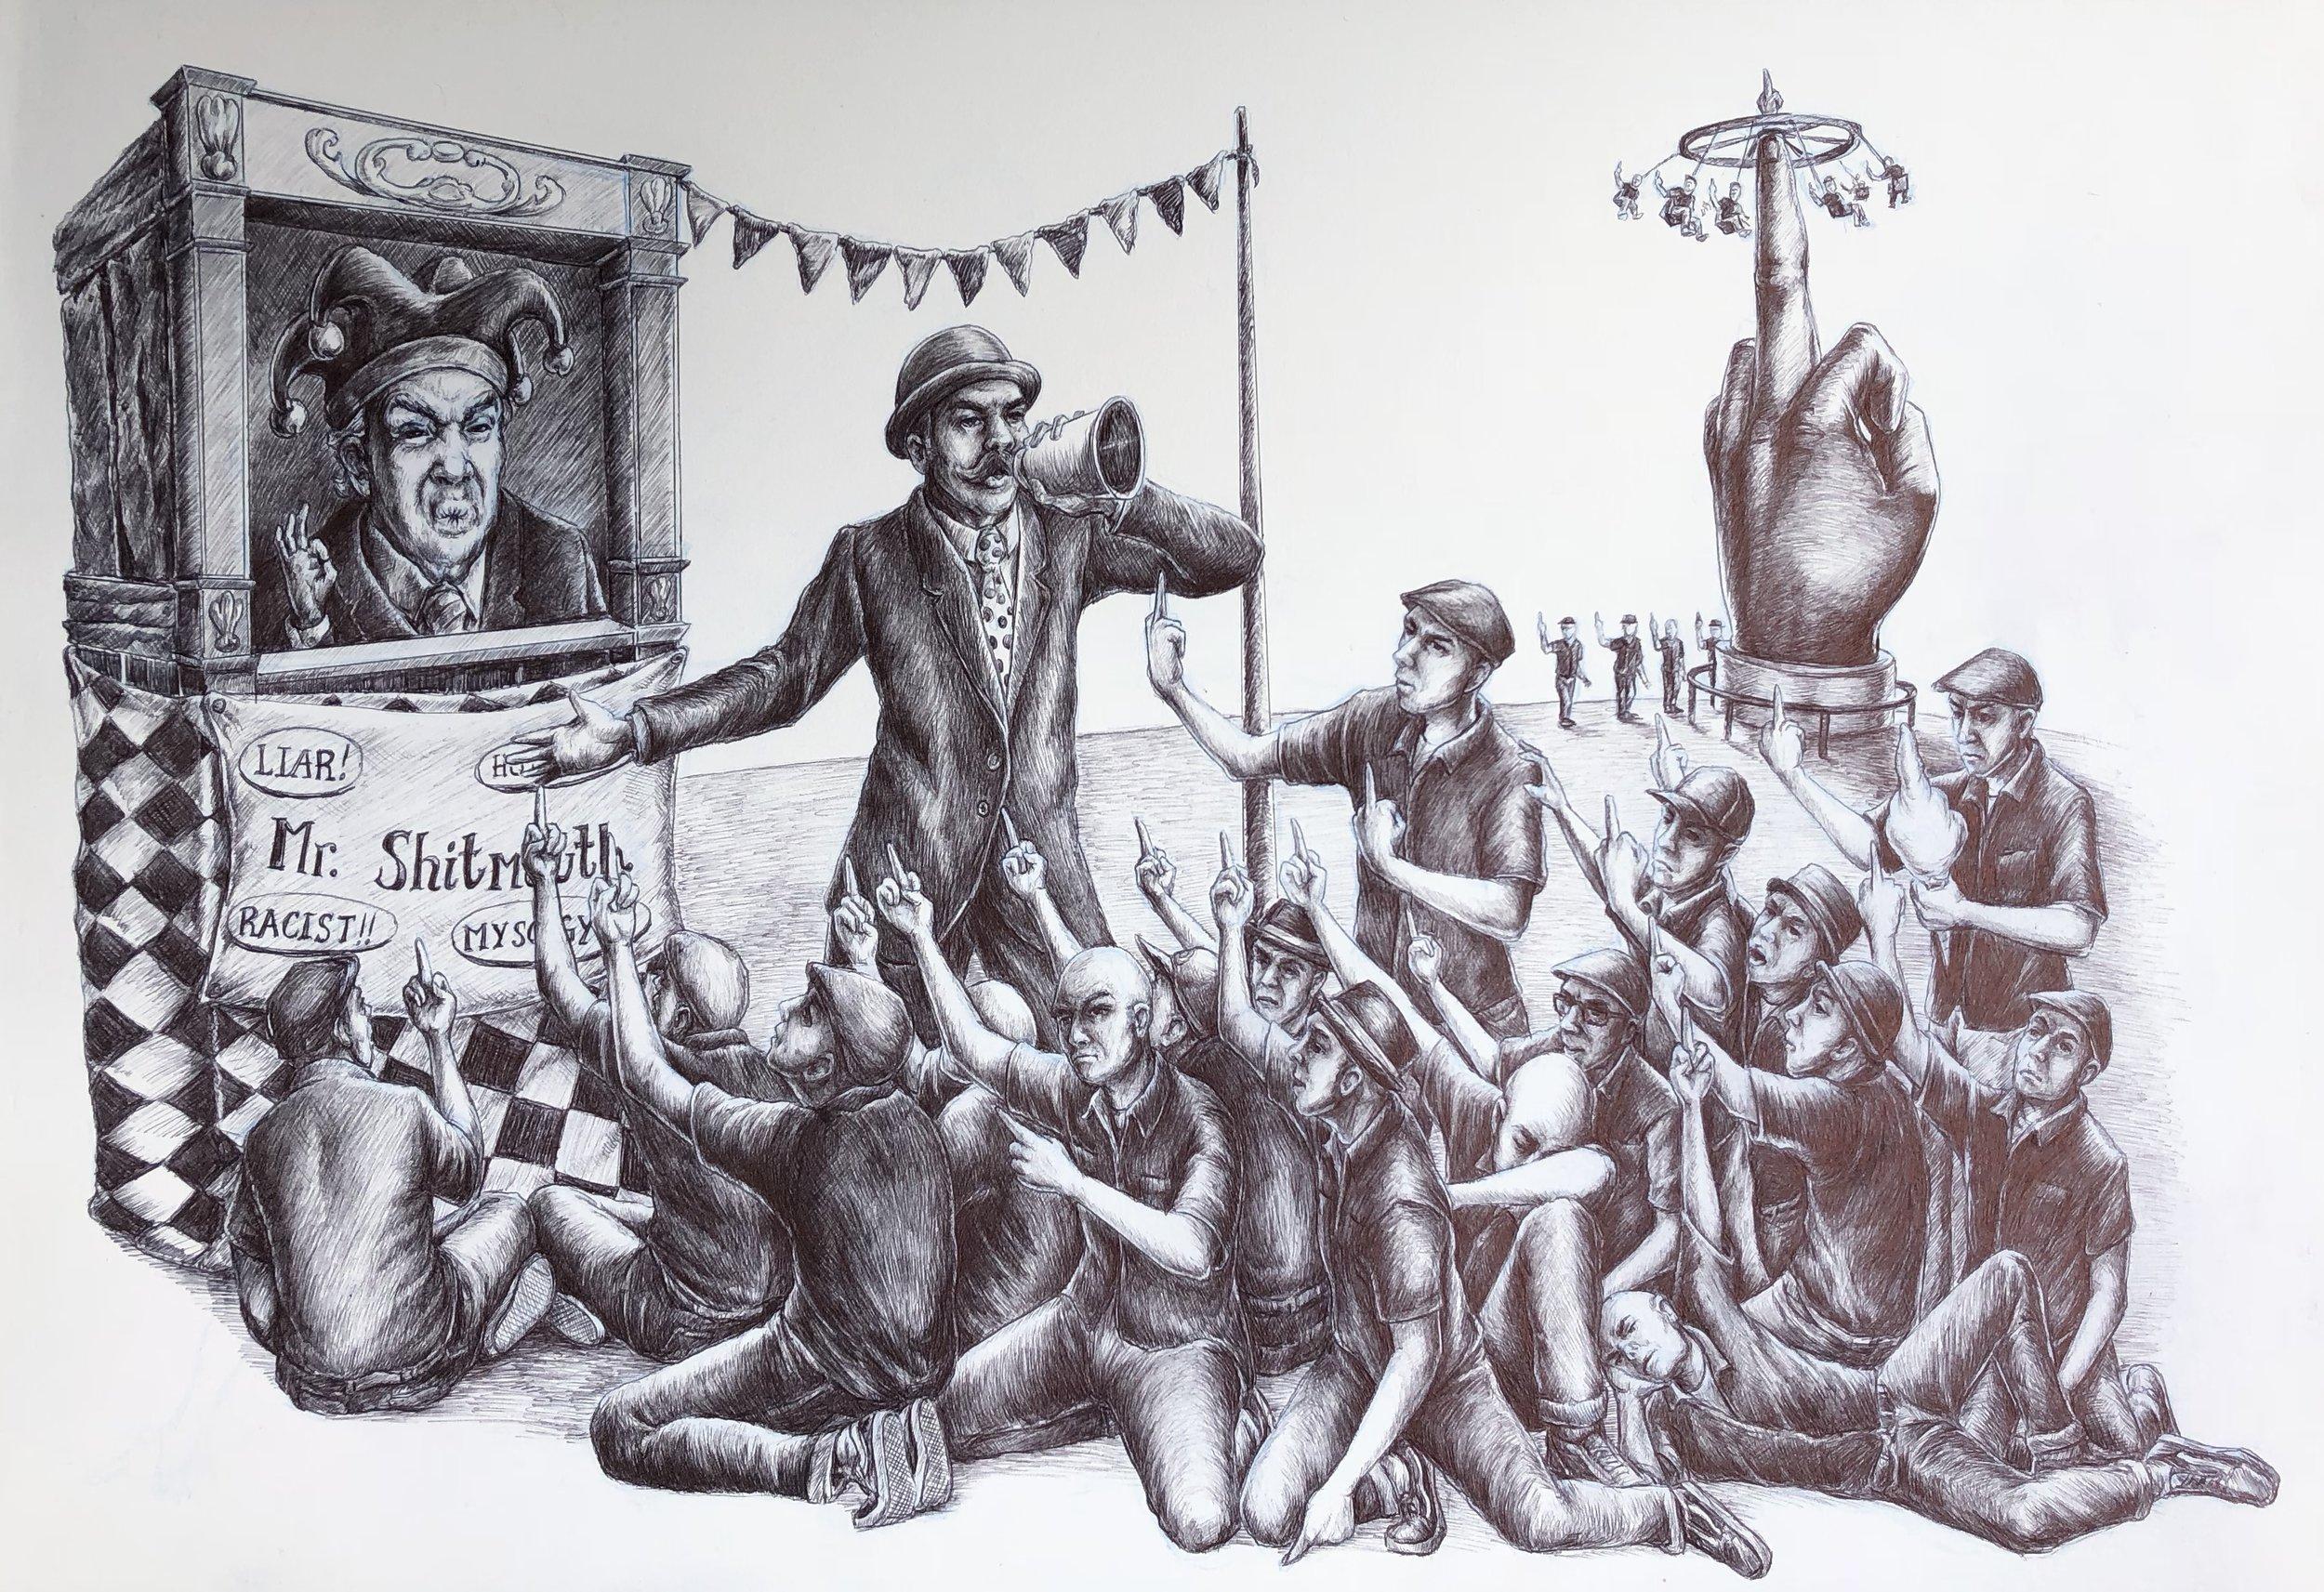 The Ostentatious Ballad of Mr. Shitmouth